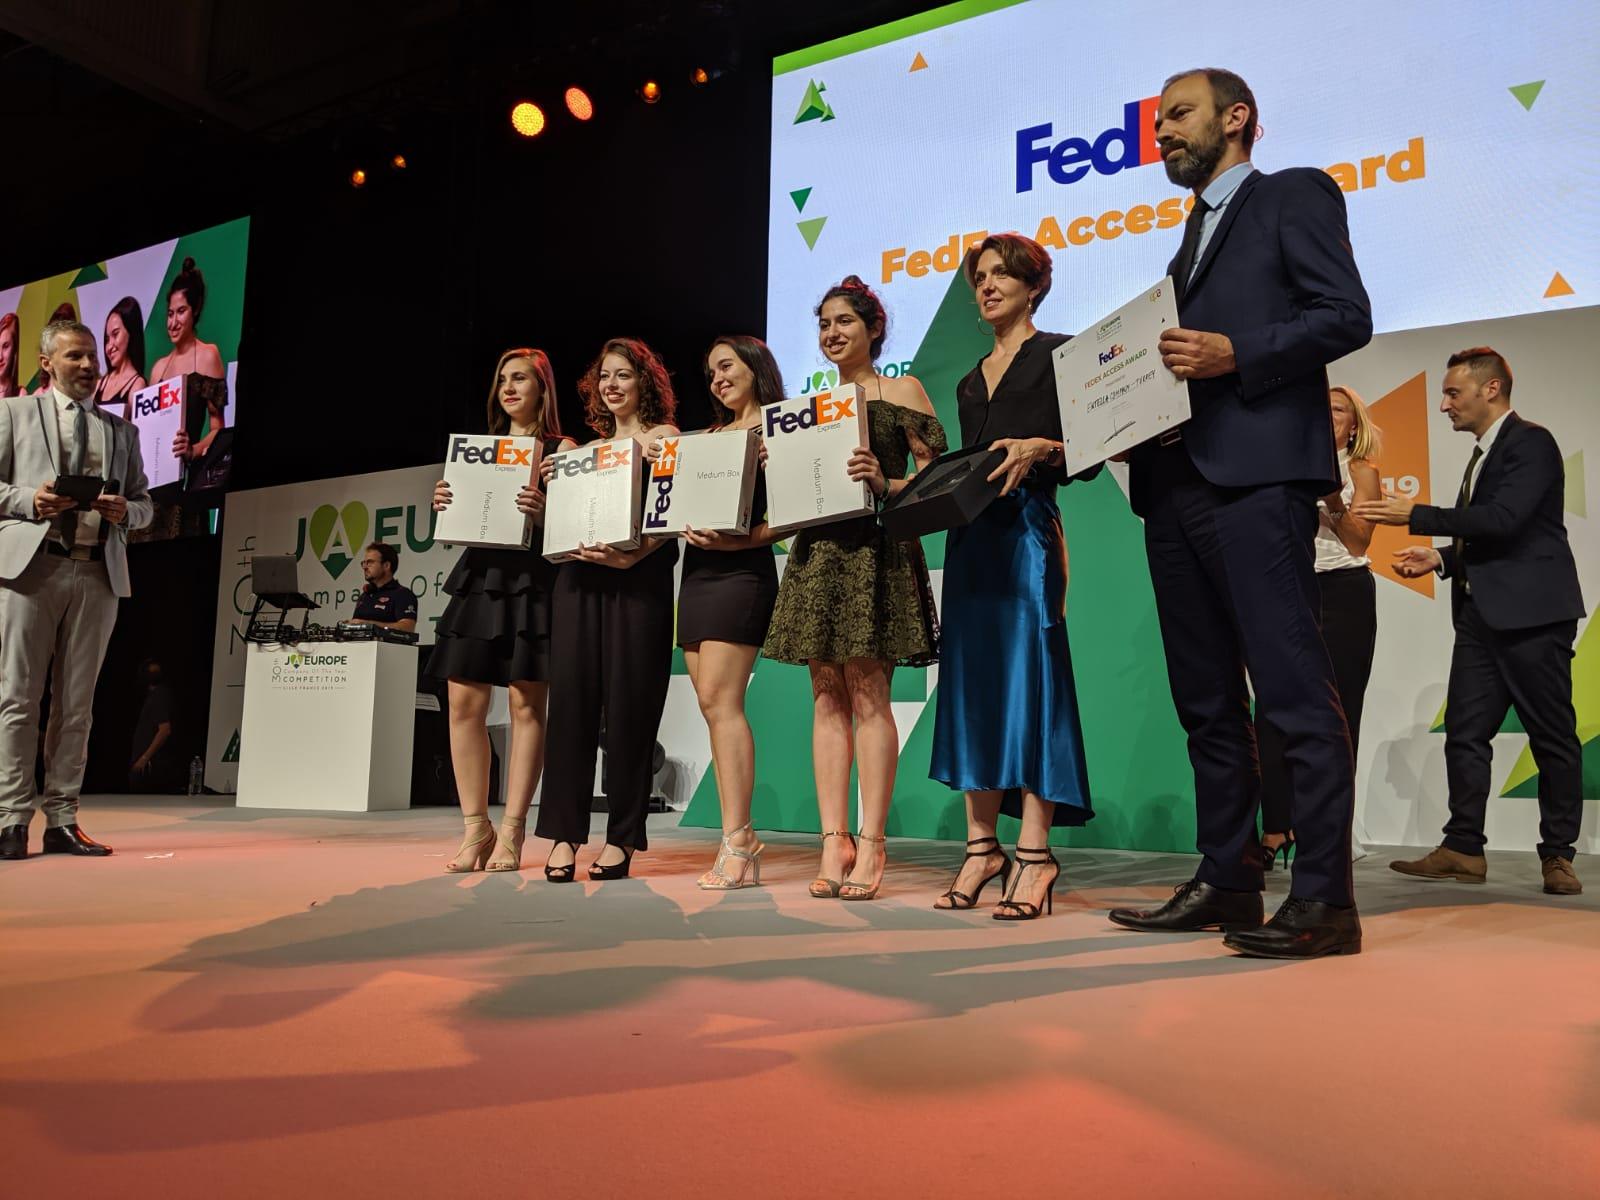 Entella Company, winner of the 2019 FedEx Access Award.